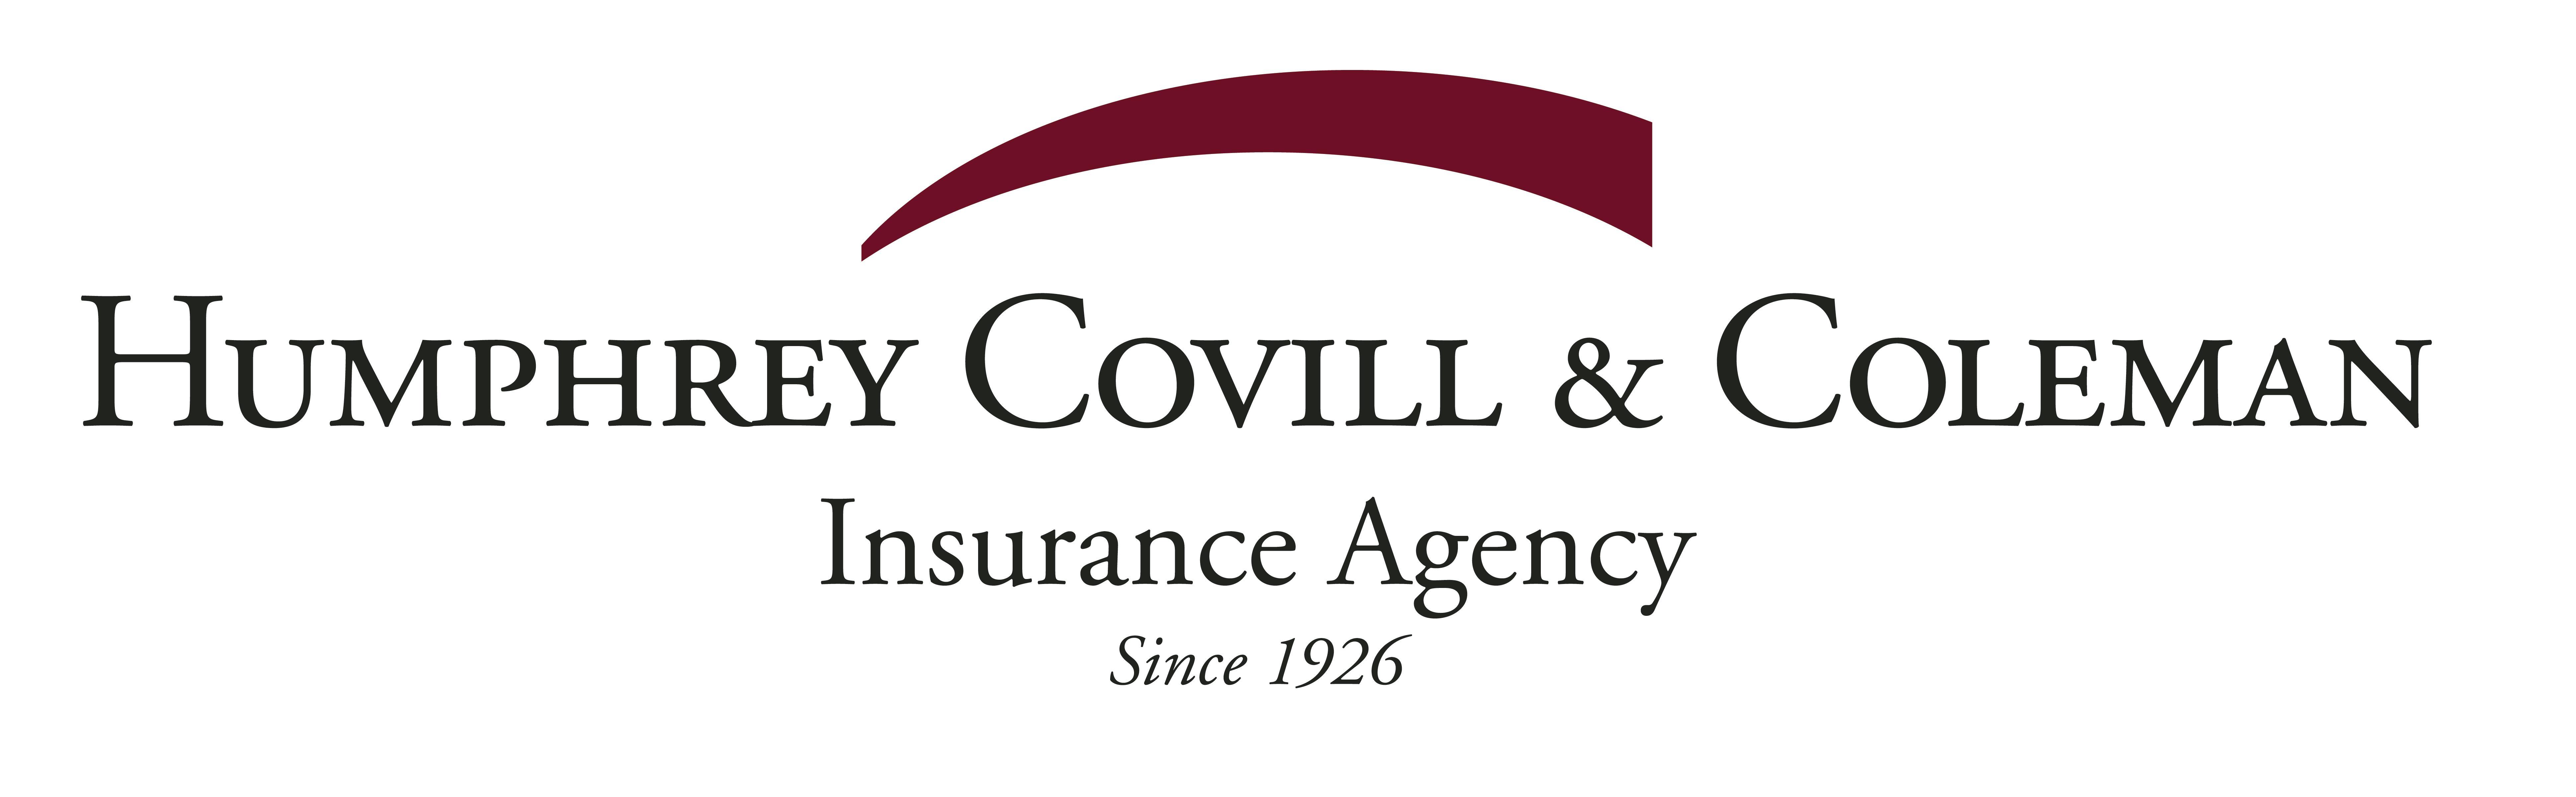 Humphrey, Covill & Coleman Insurance Agency Inc. image 0